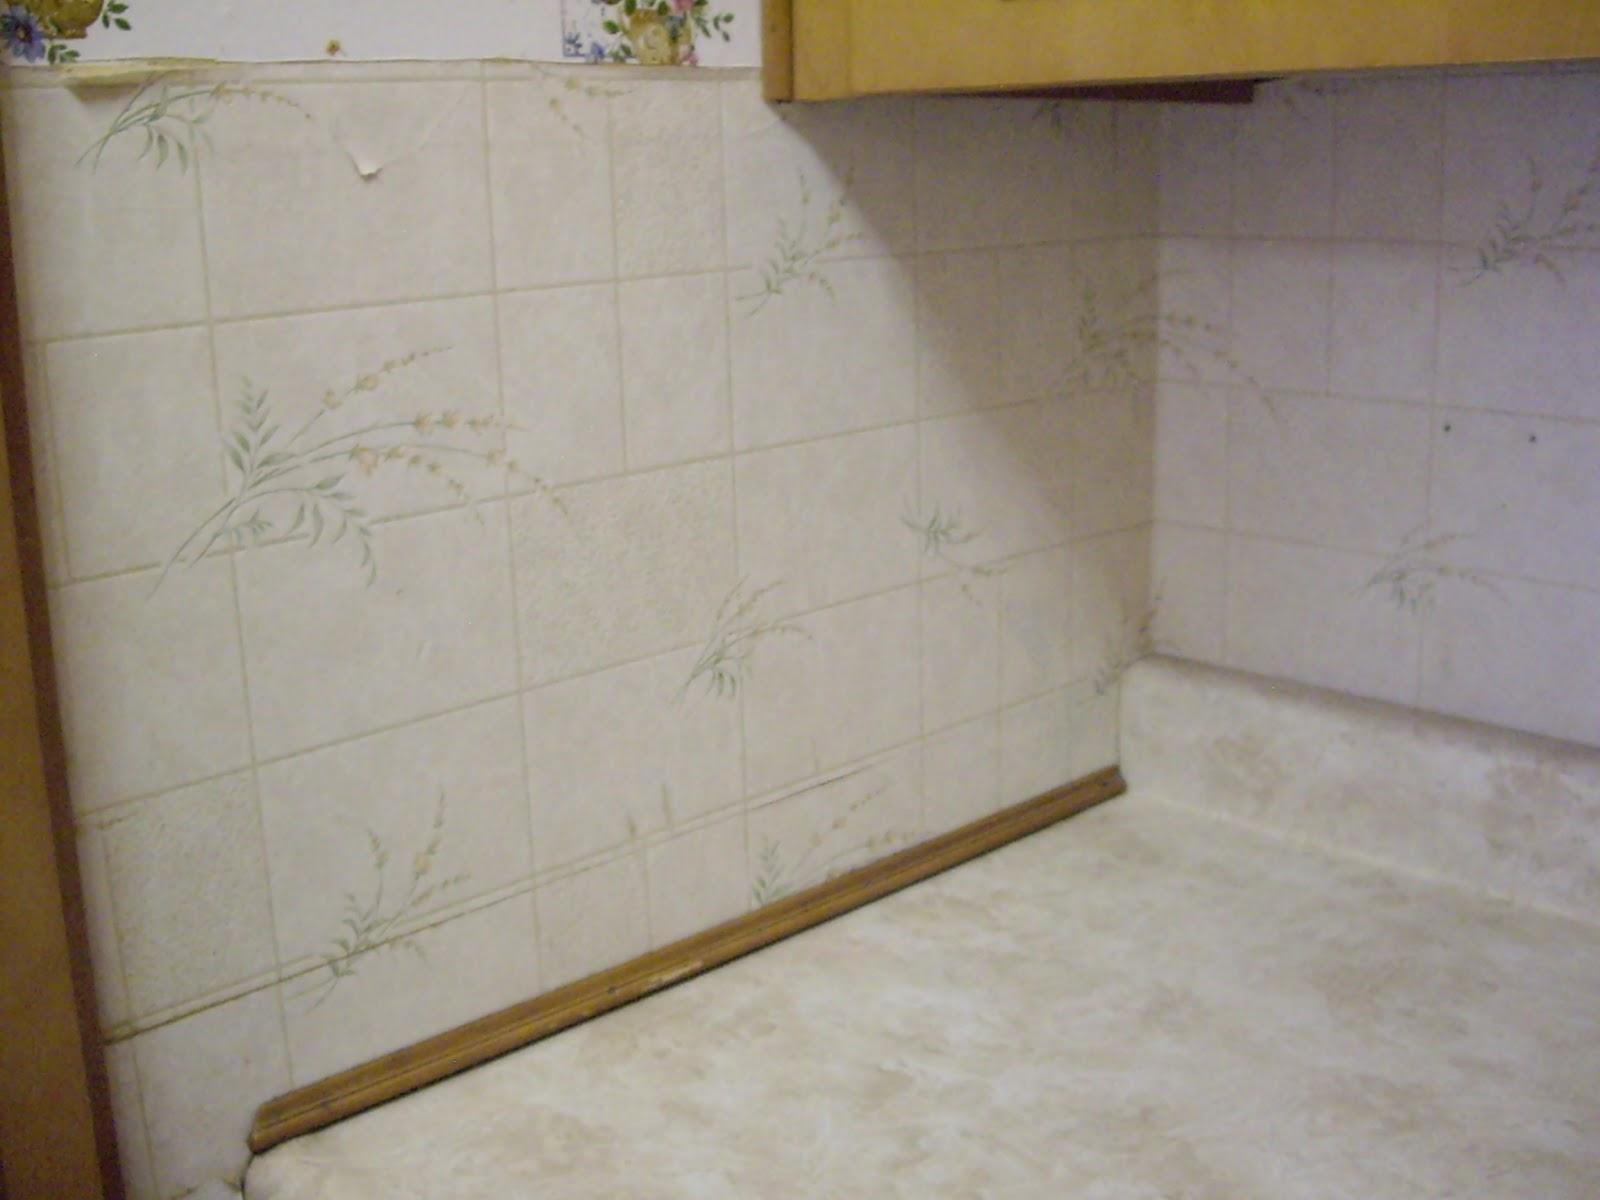 Vinyl Wallpaper Kitchen Backsplash Faucets With Sprayer Find Best Wallpapers Beadboard Shoe Molding And Dowels